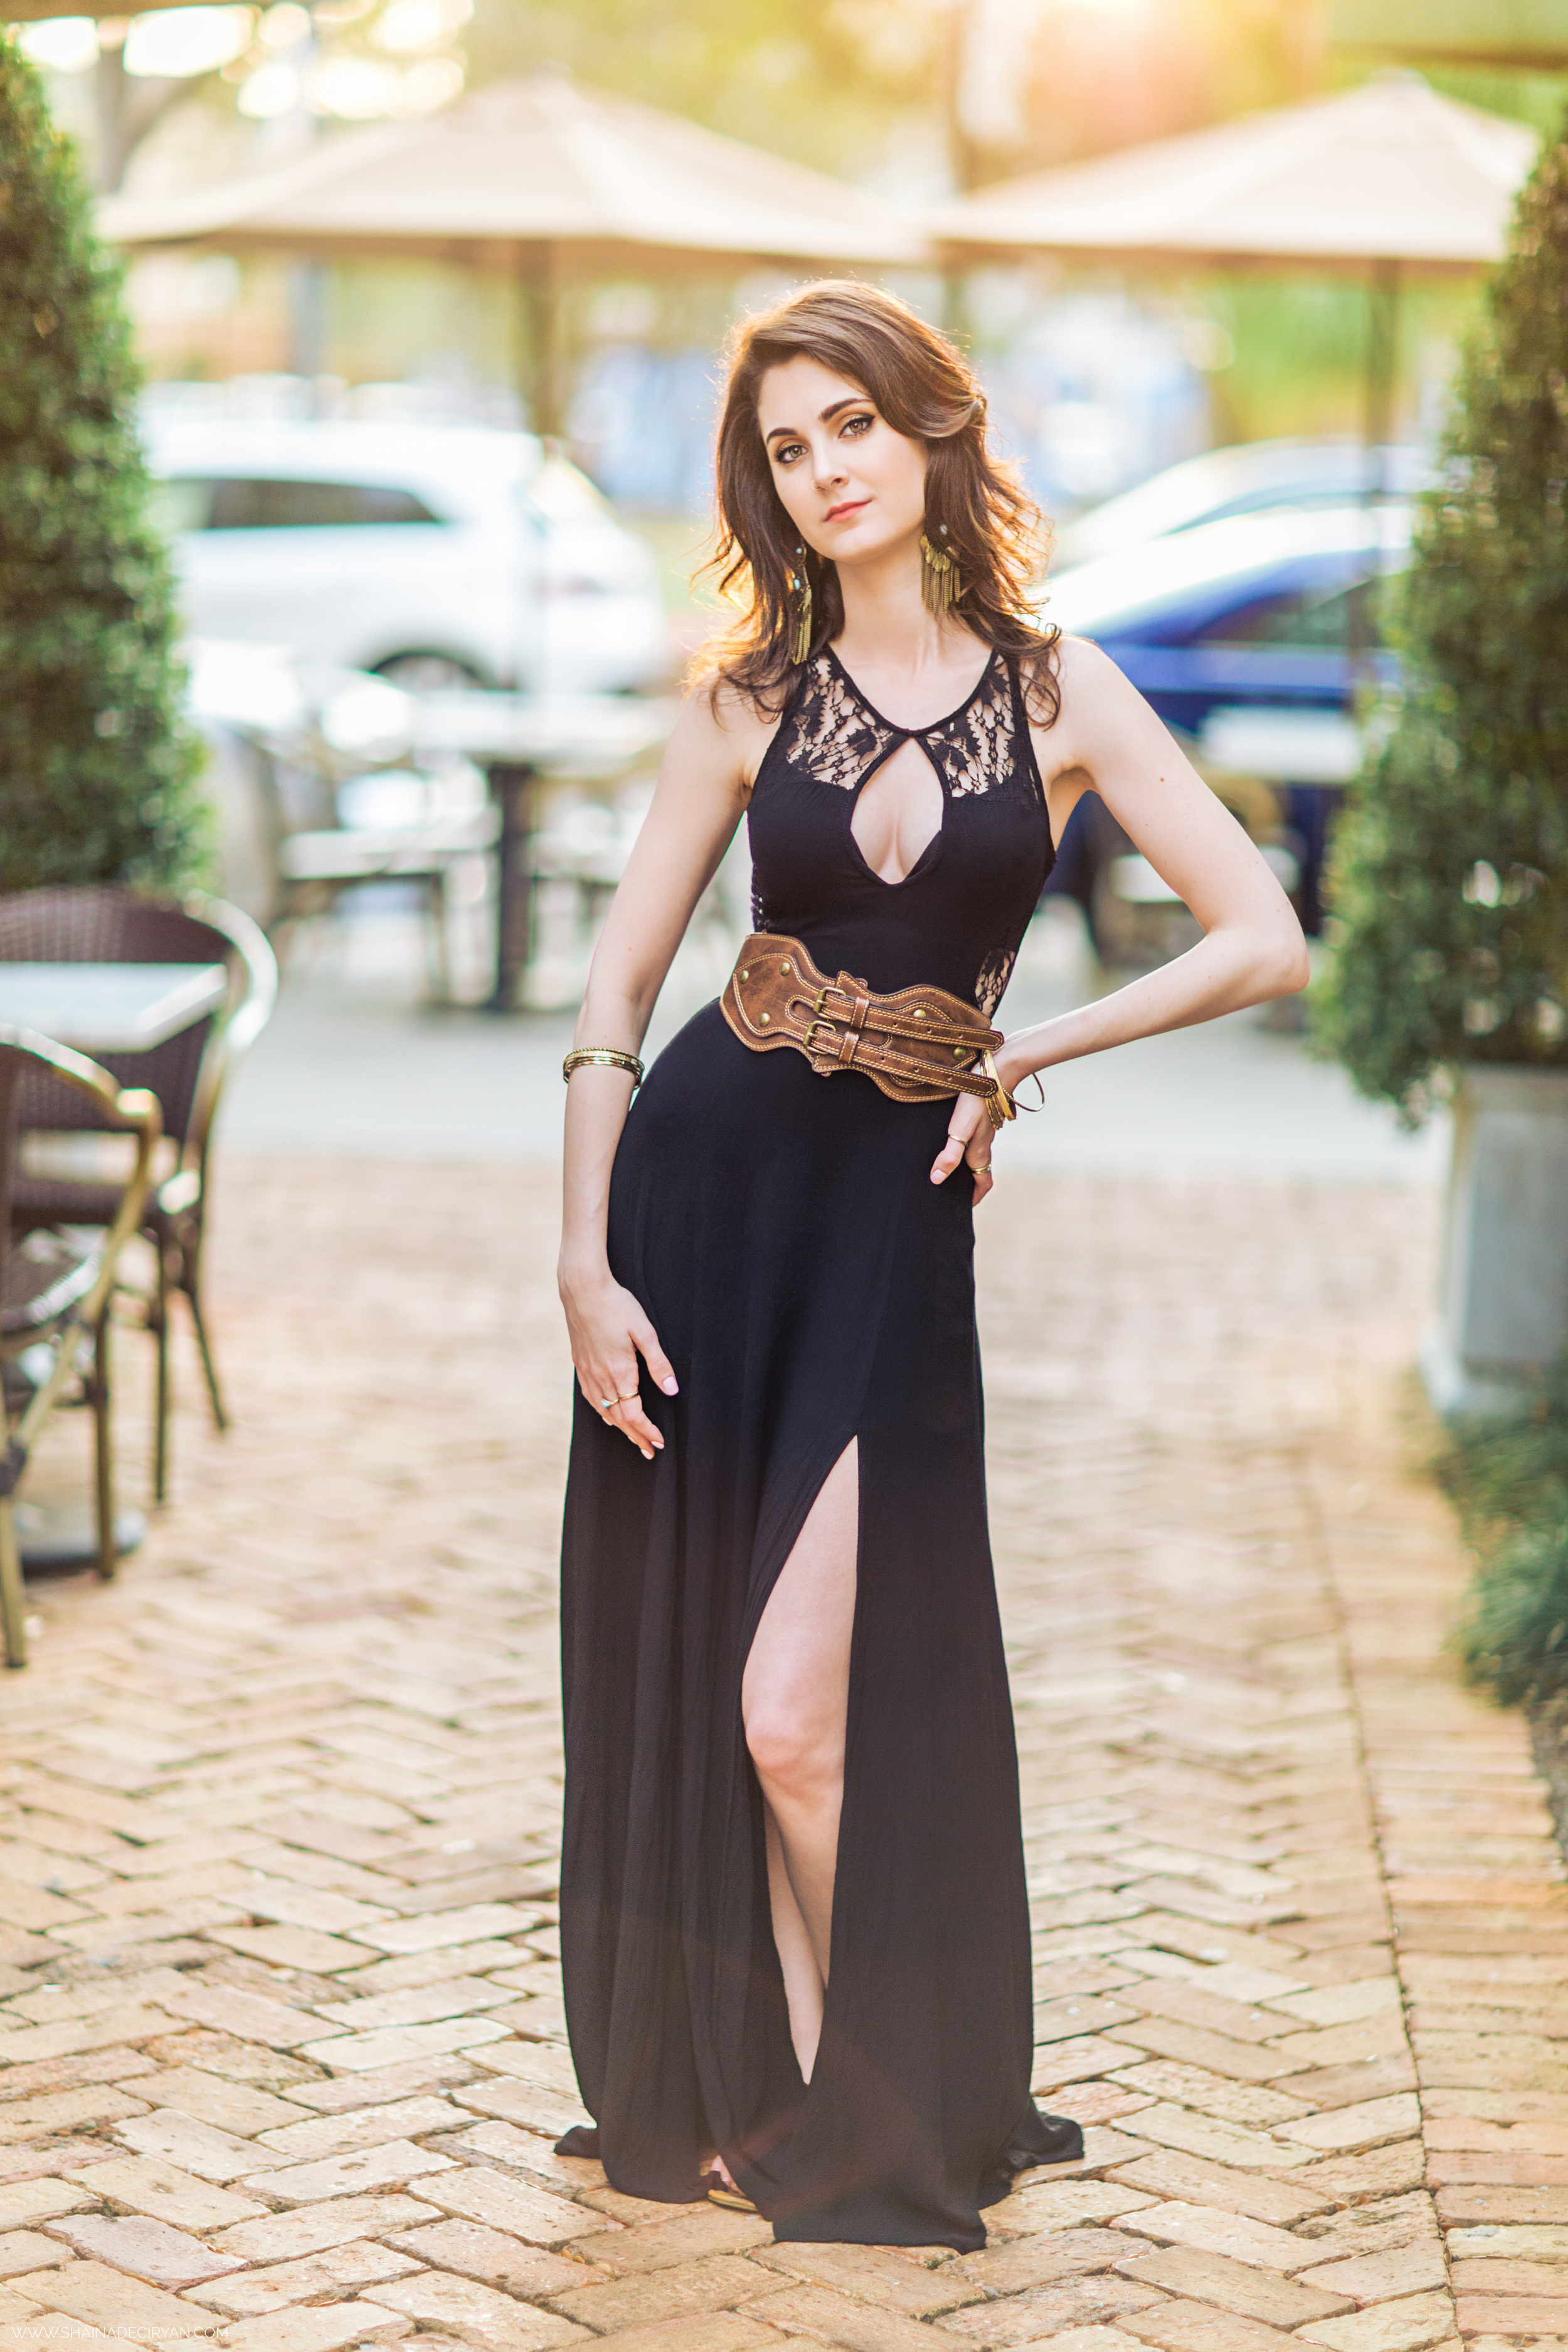 Orlando Winter Park Model - Alex Knape - boho style beauty 26.jpg